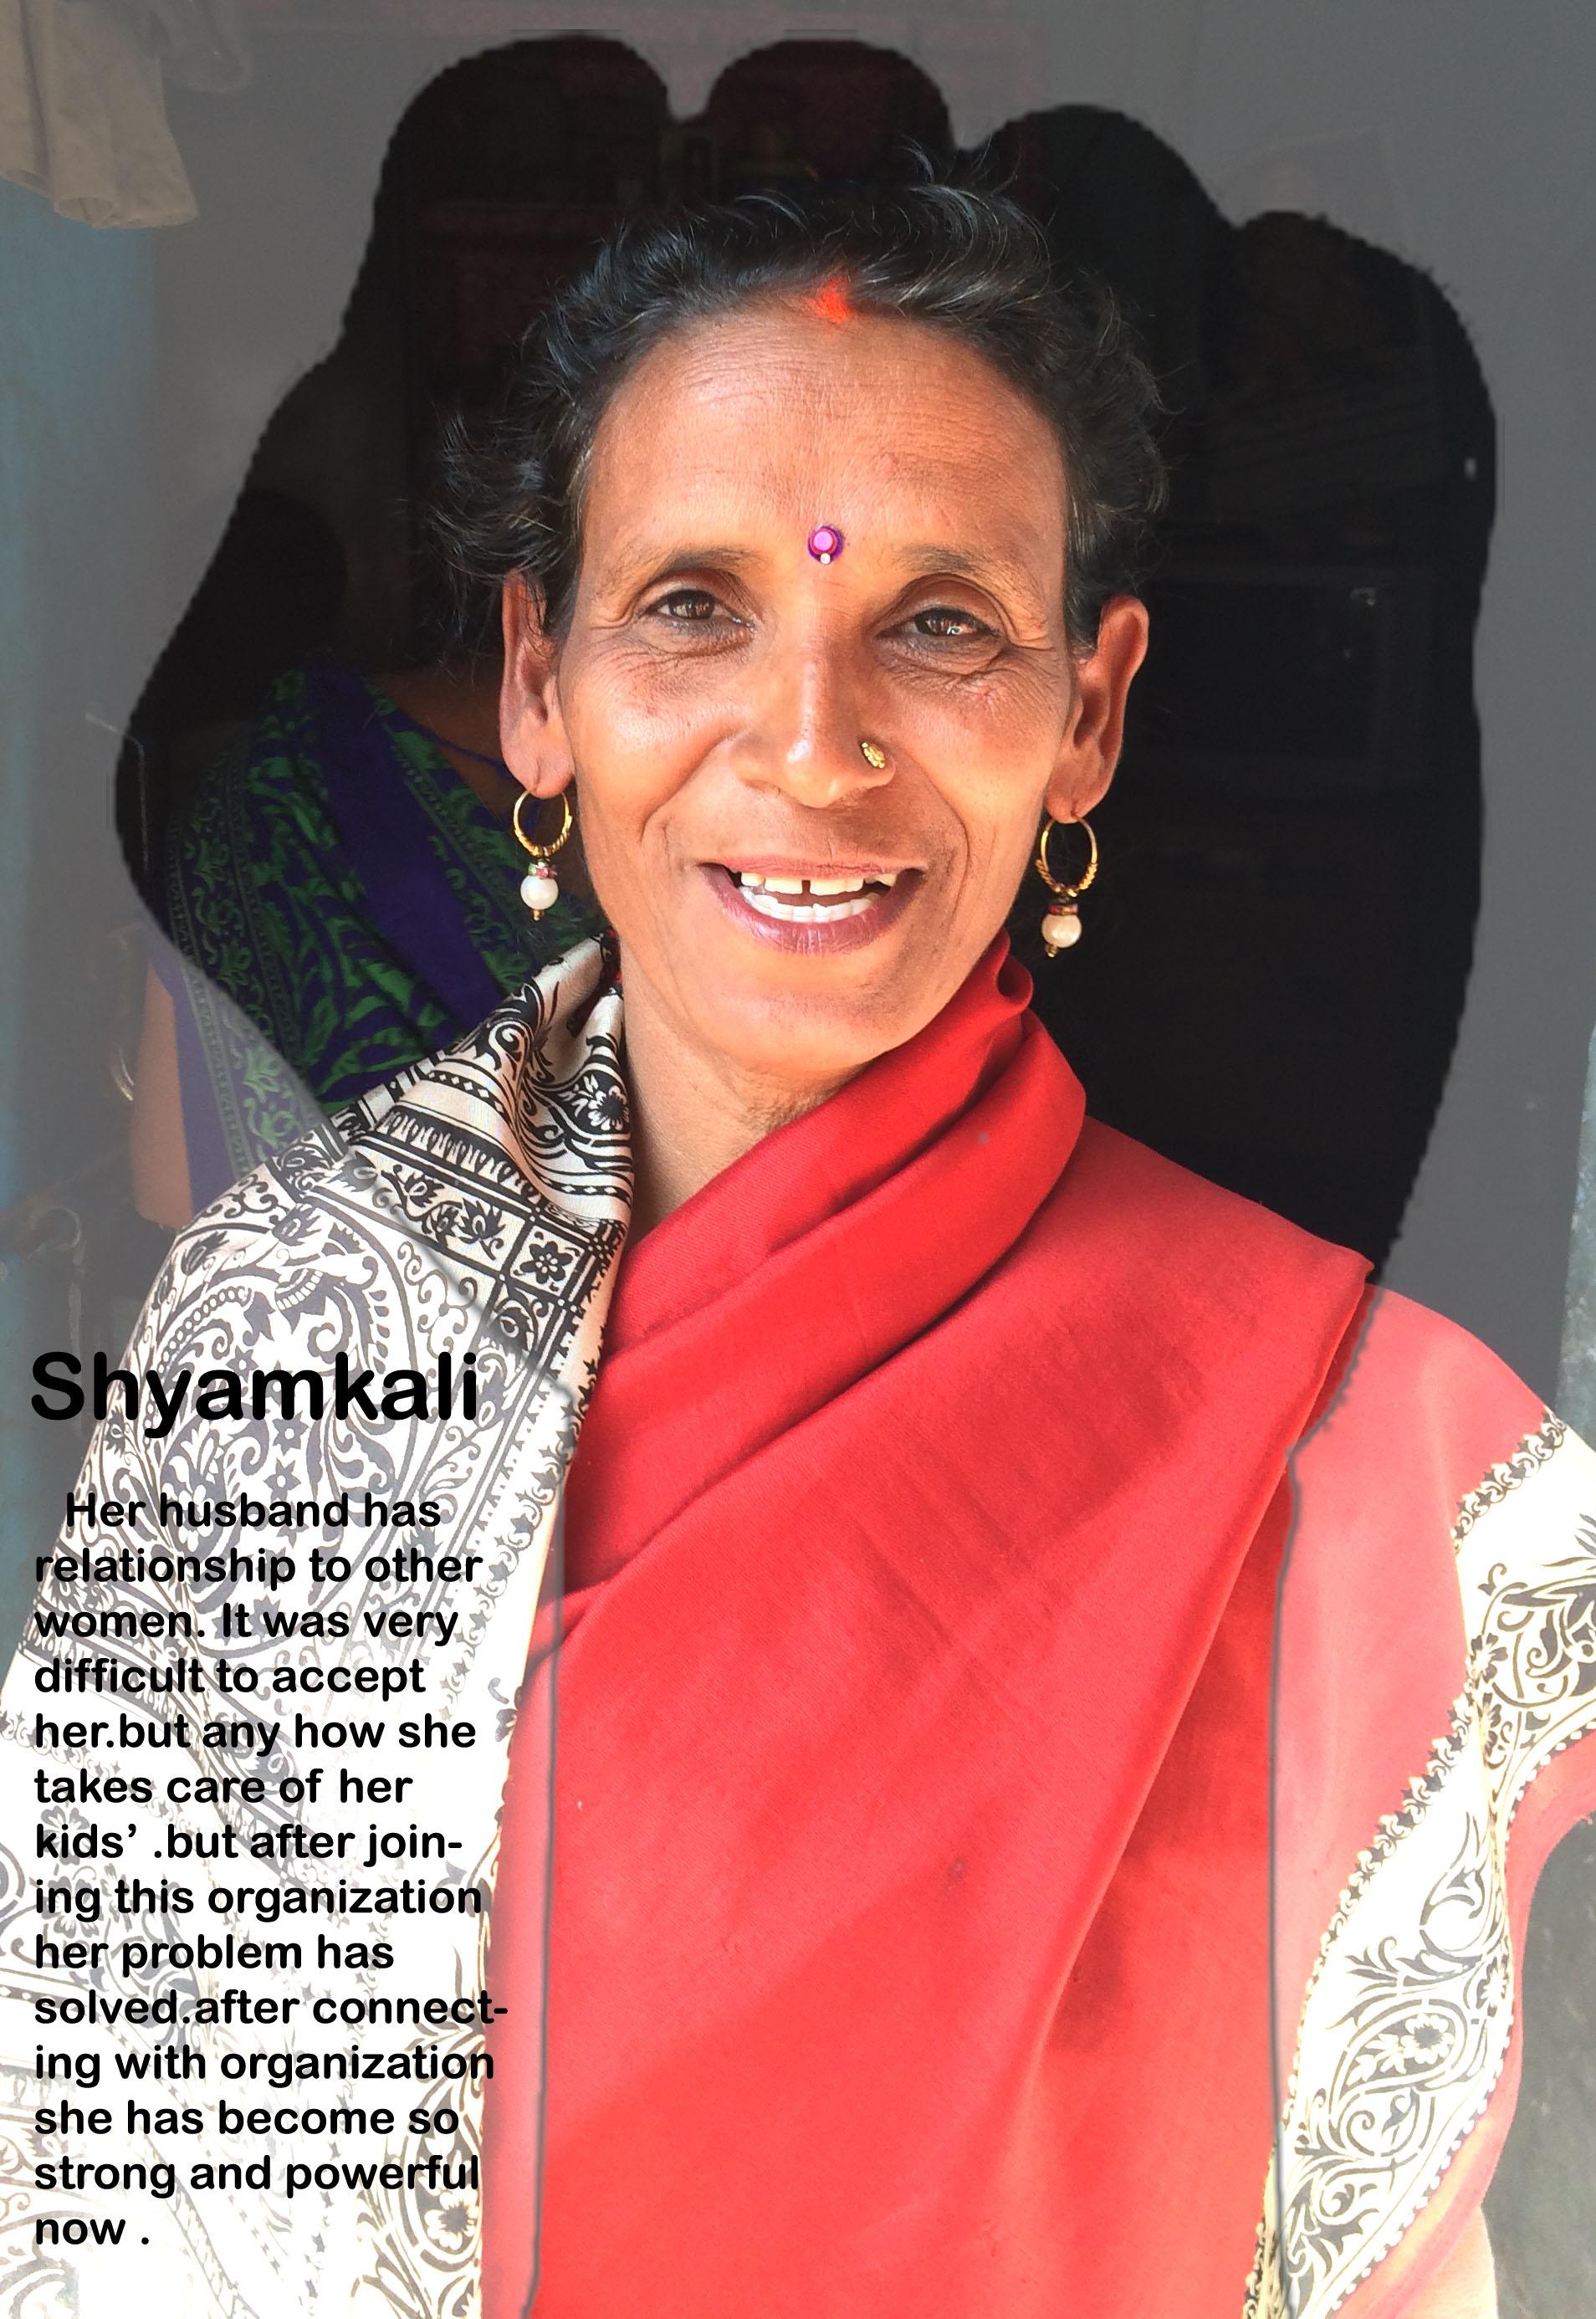 Shyam kali women human right defender--.jpg